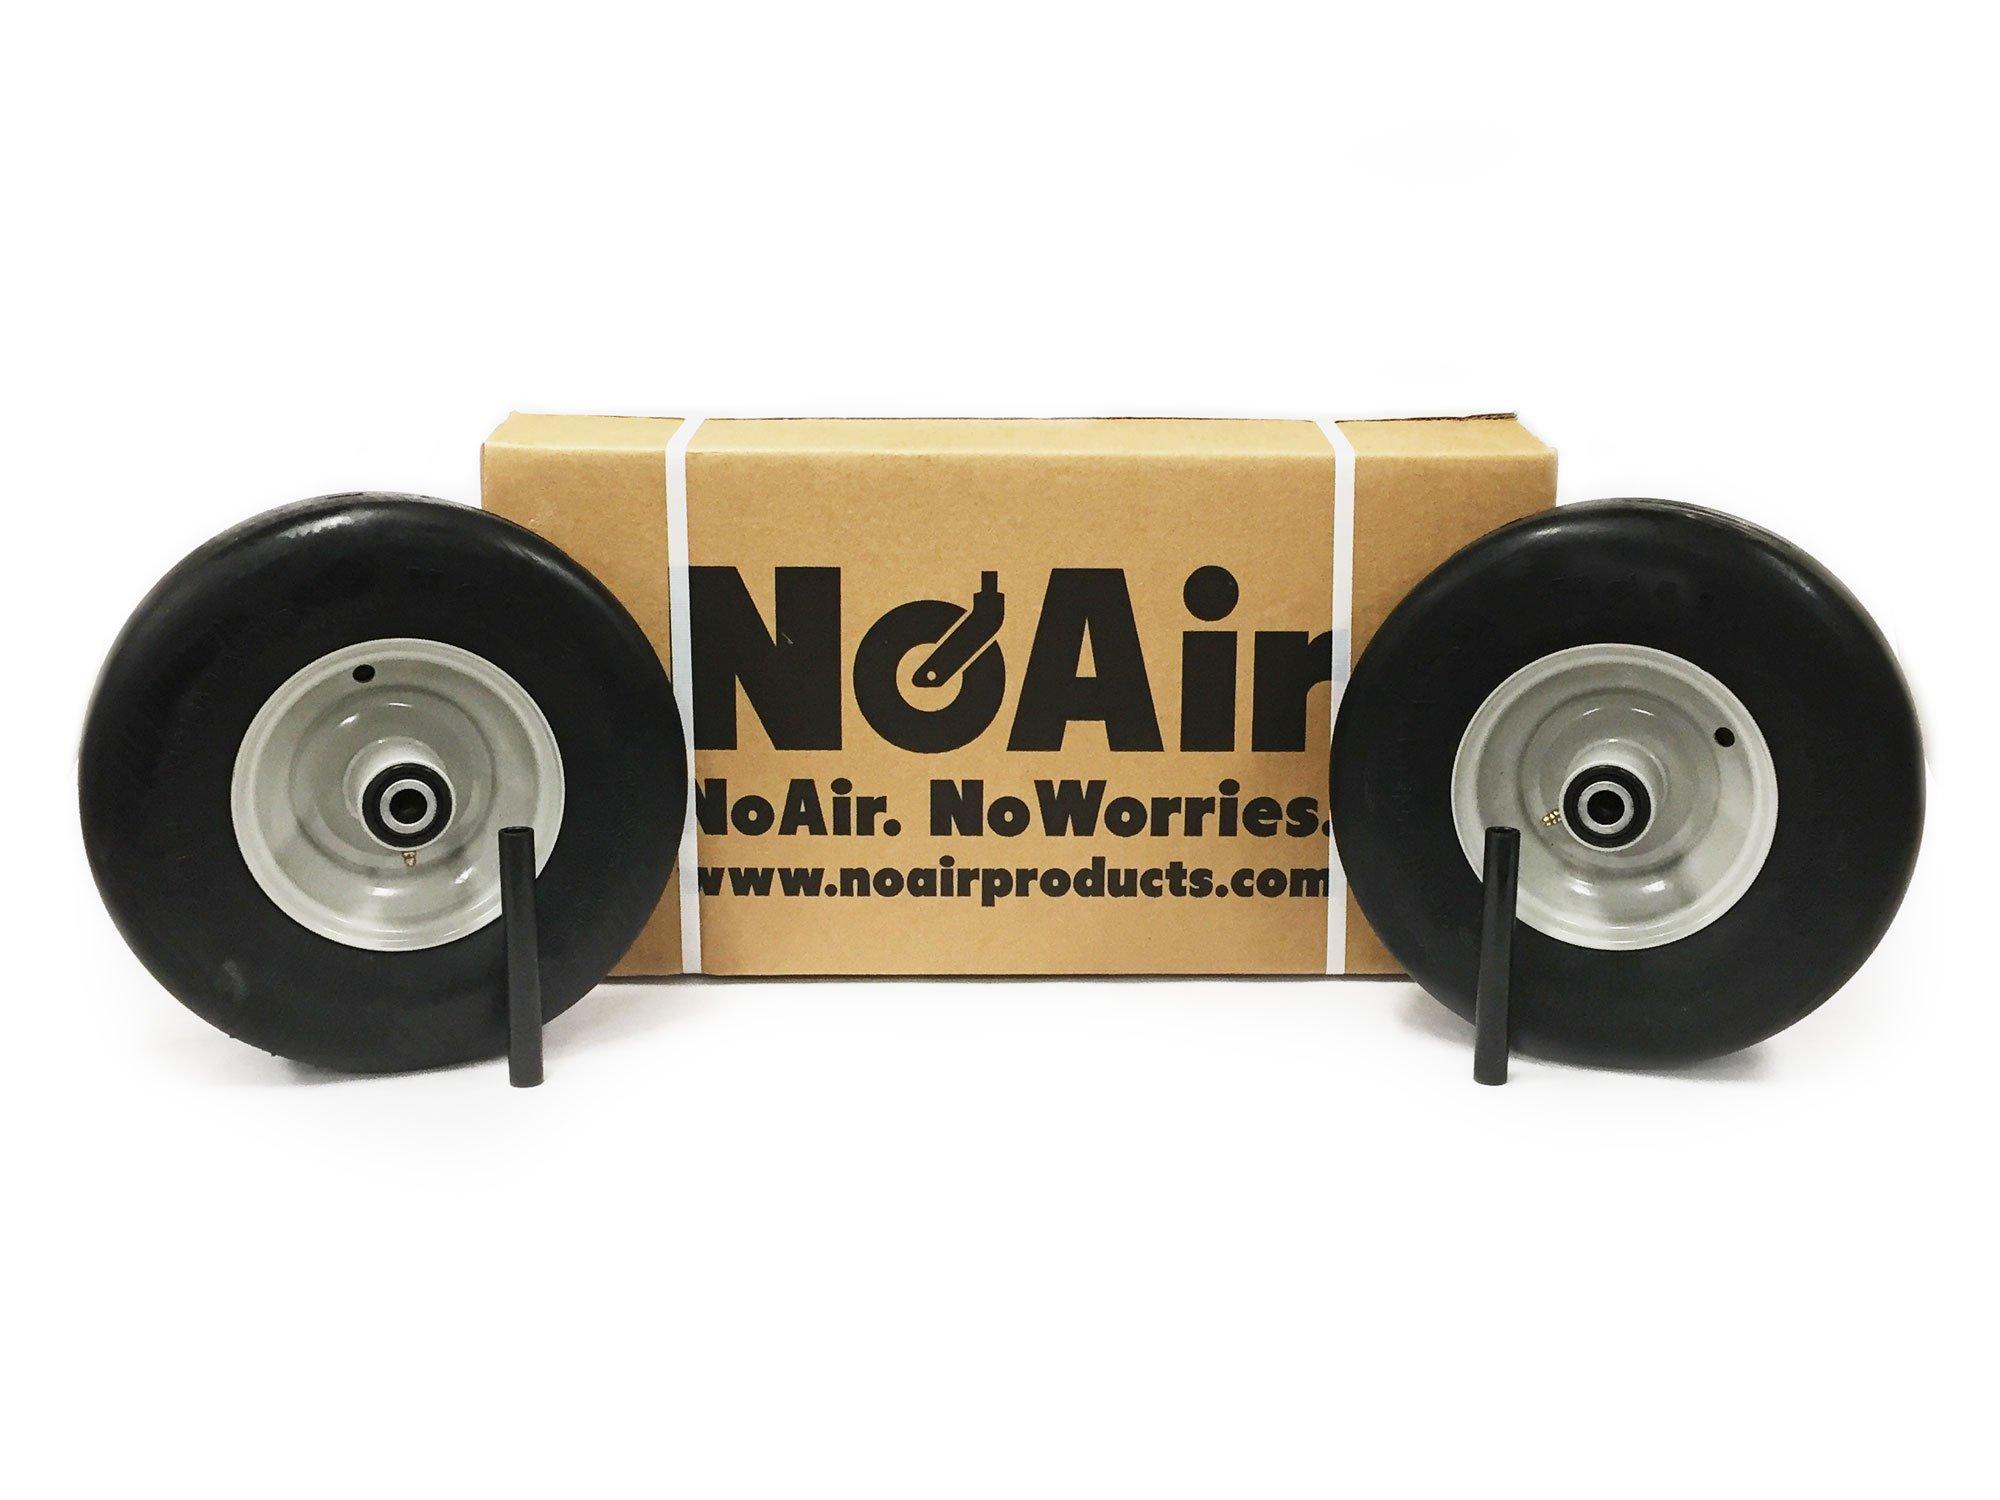 (2) Gravely Ariens Flat Free Tire Assemblies 13x5.00-6 Light Gray Repl 07100835 by NoAir